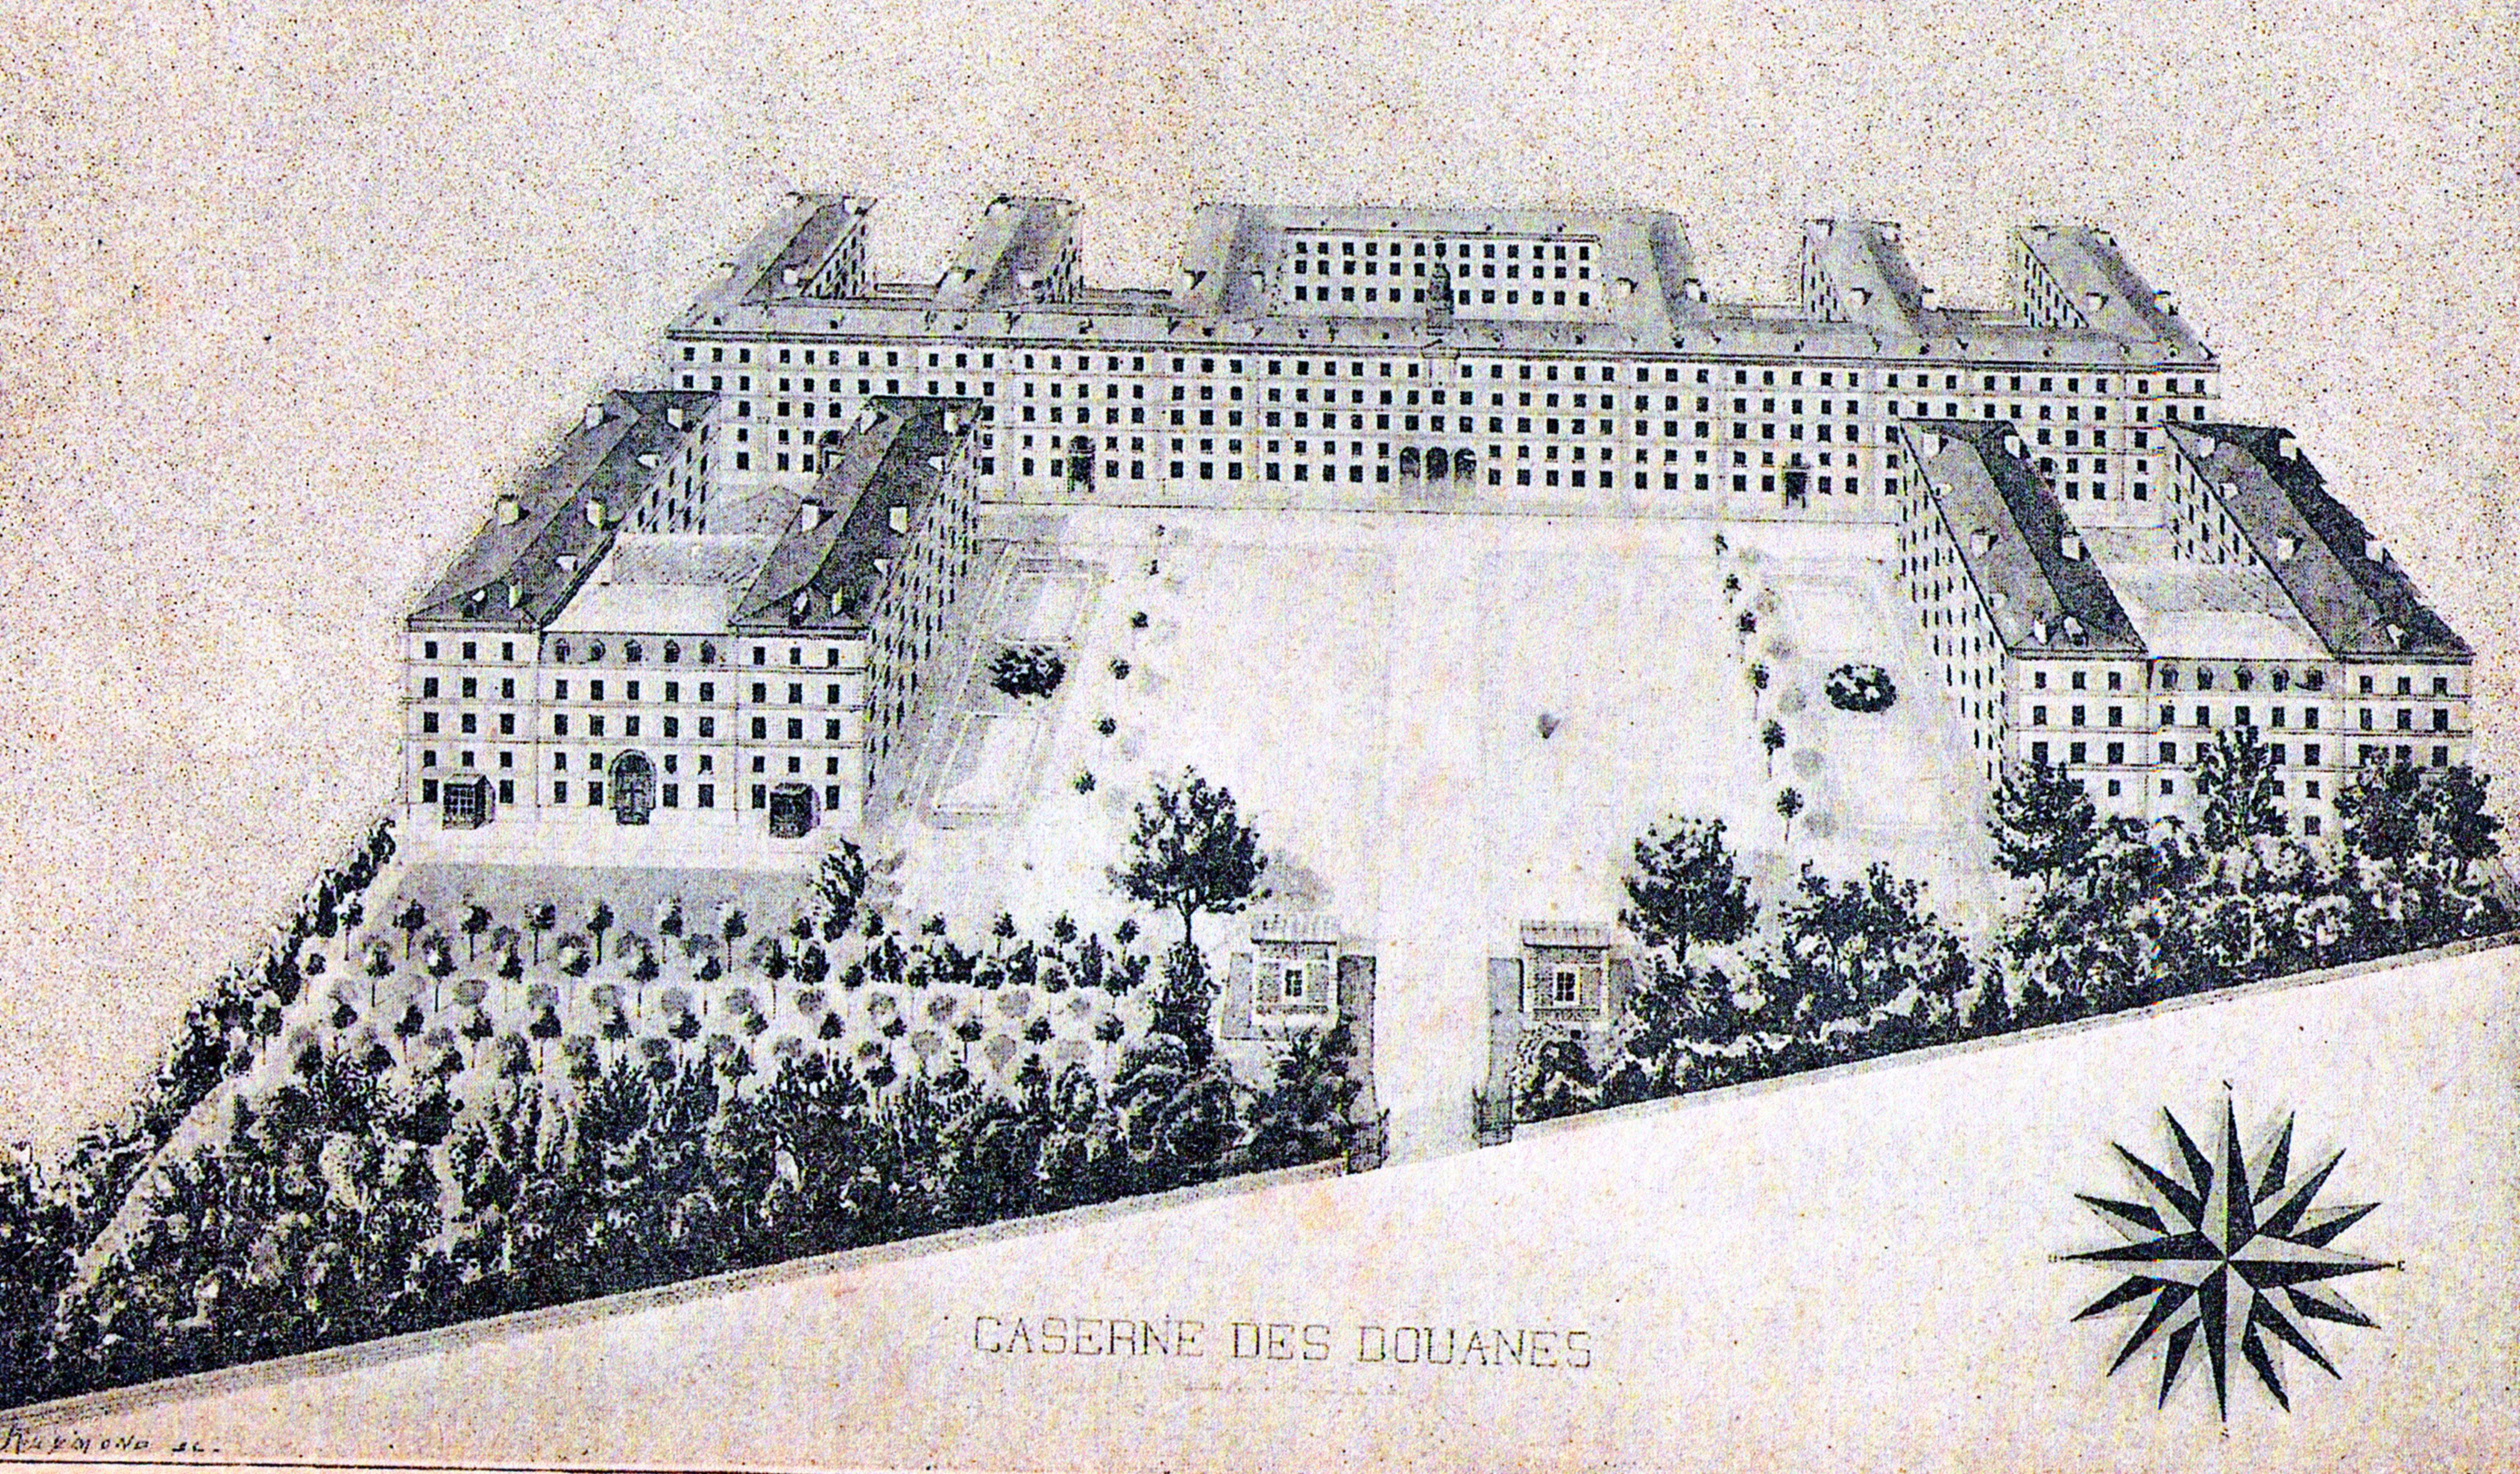 La caserne vers 1860.